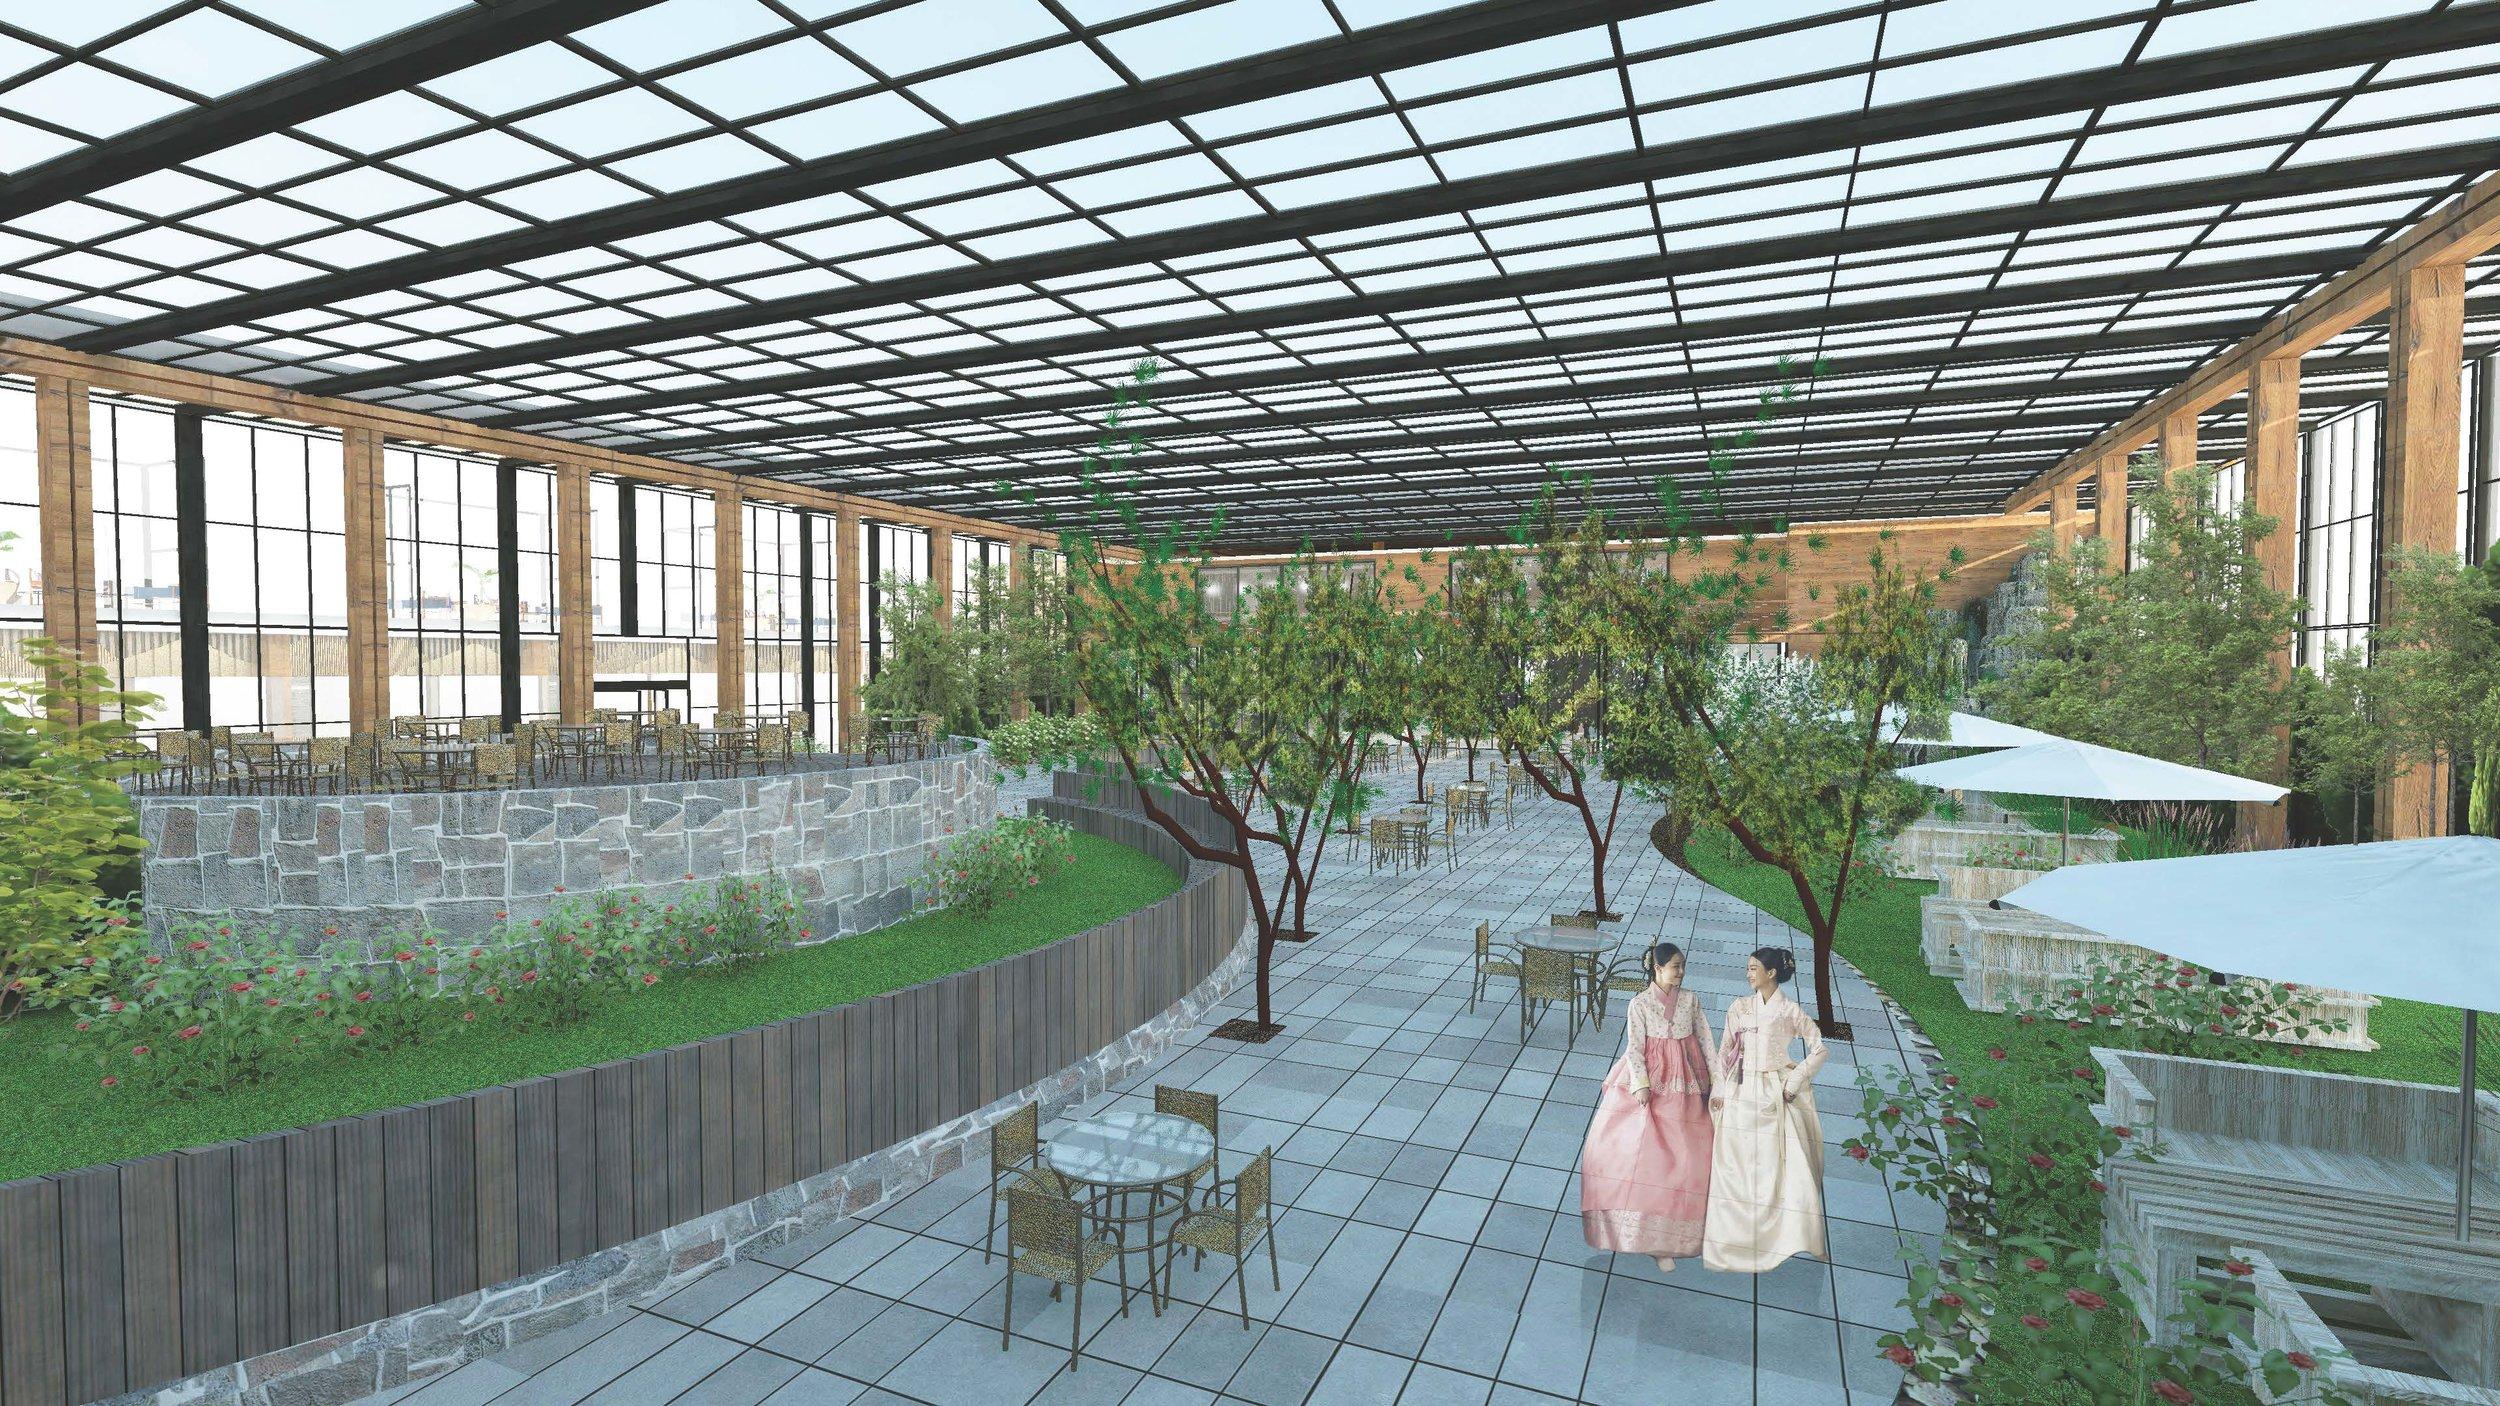 lin-cui-mfa-1-korean-style-hotel_35010965241_o.jpg